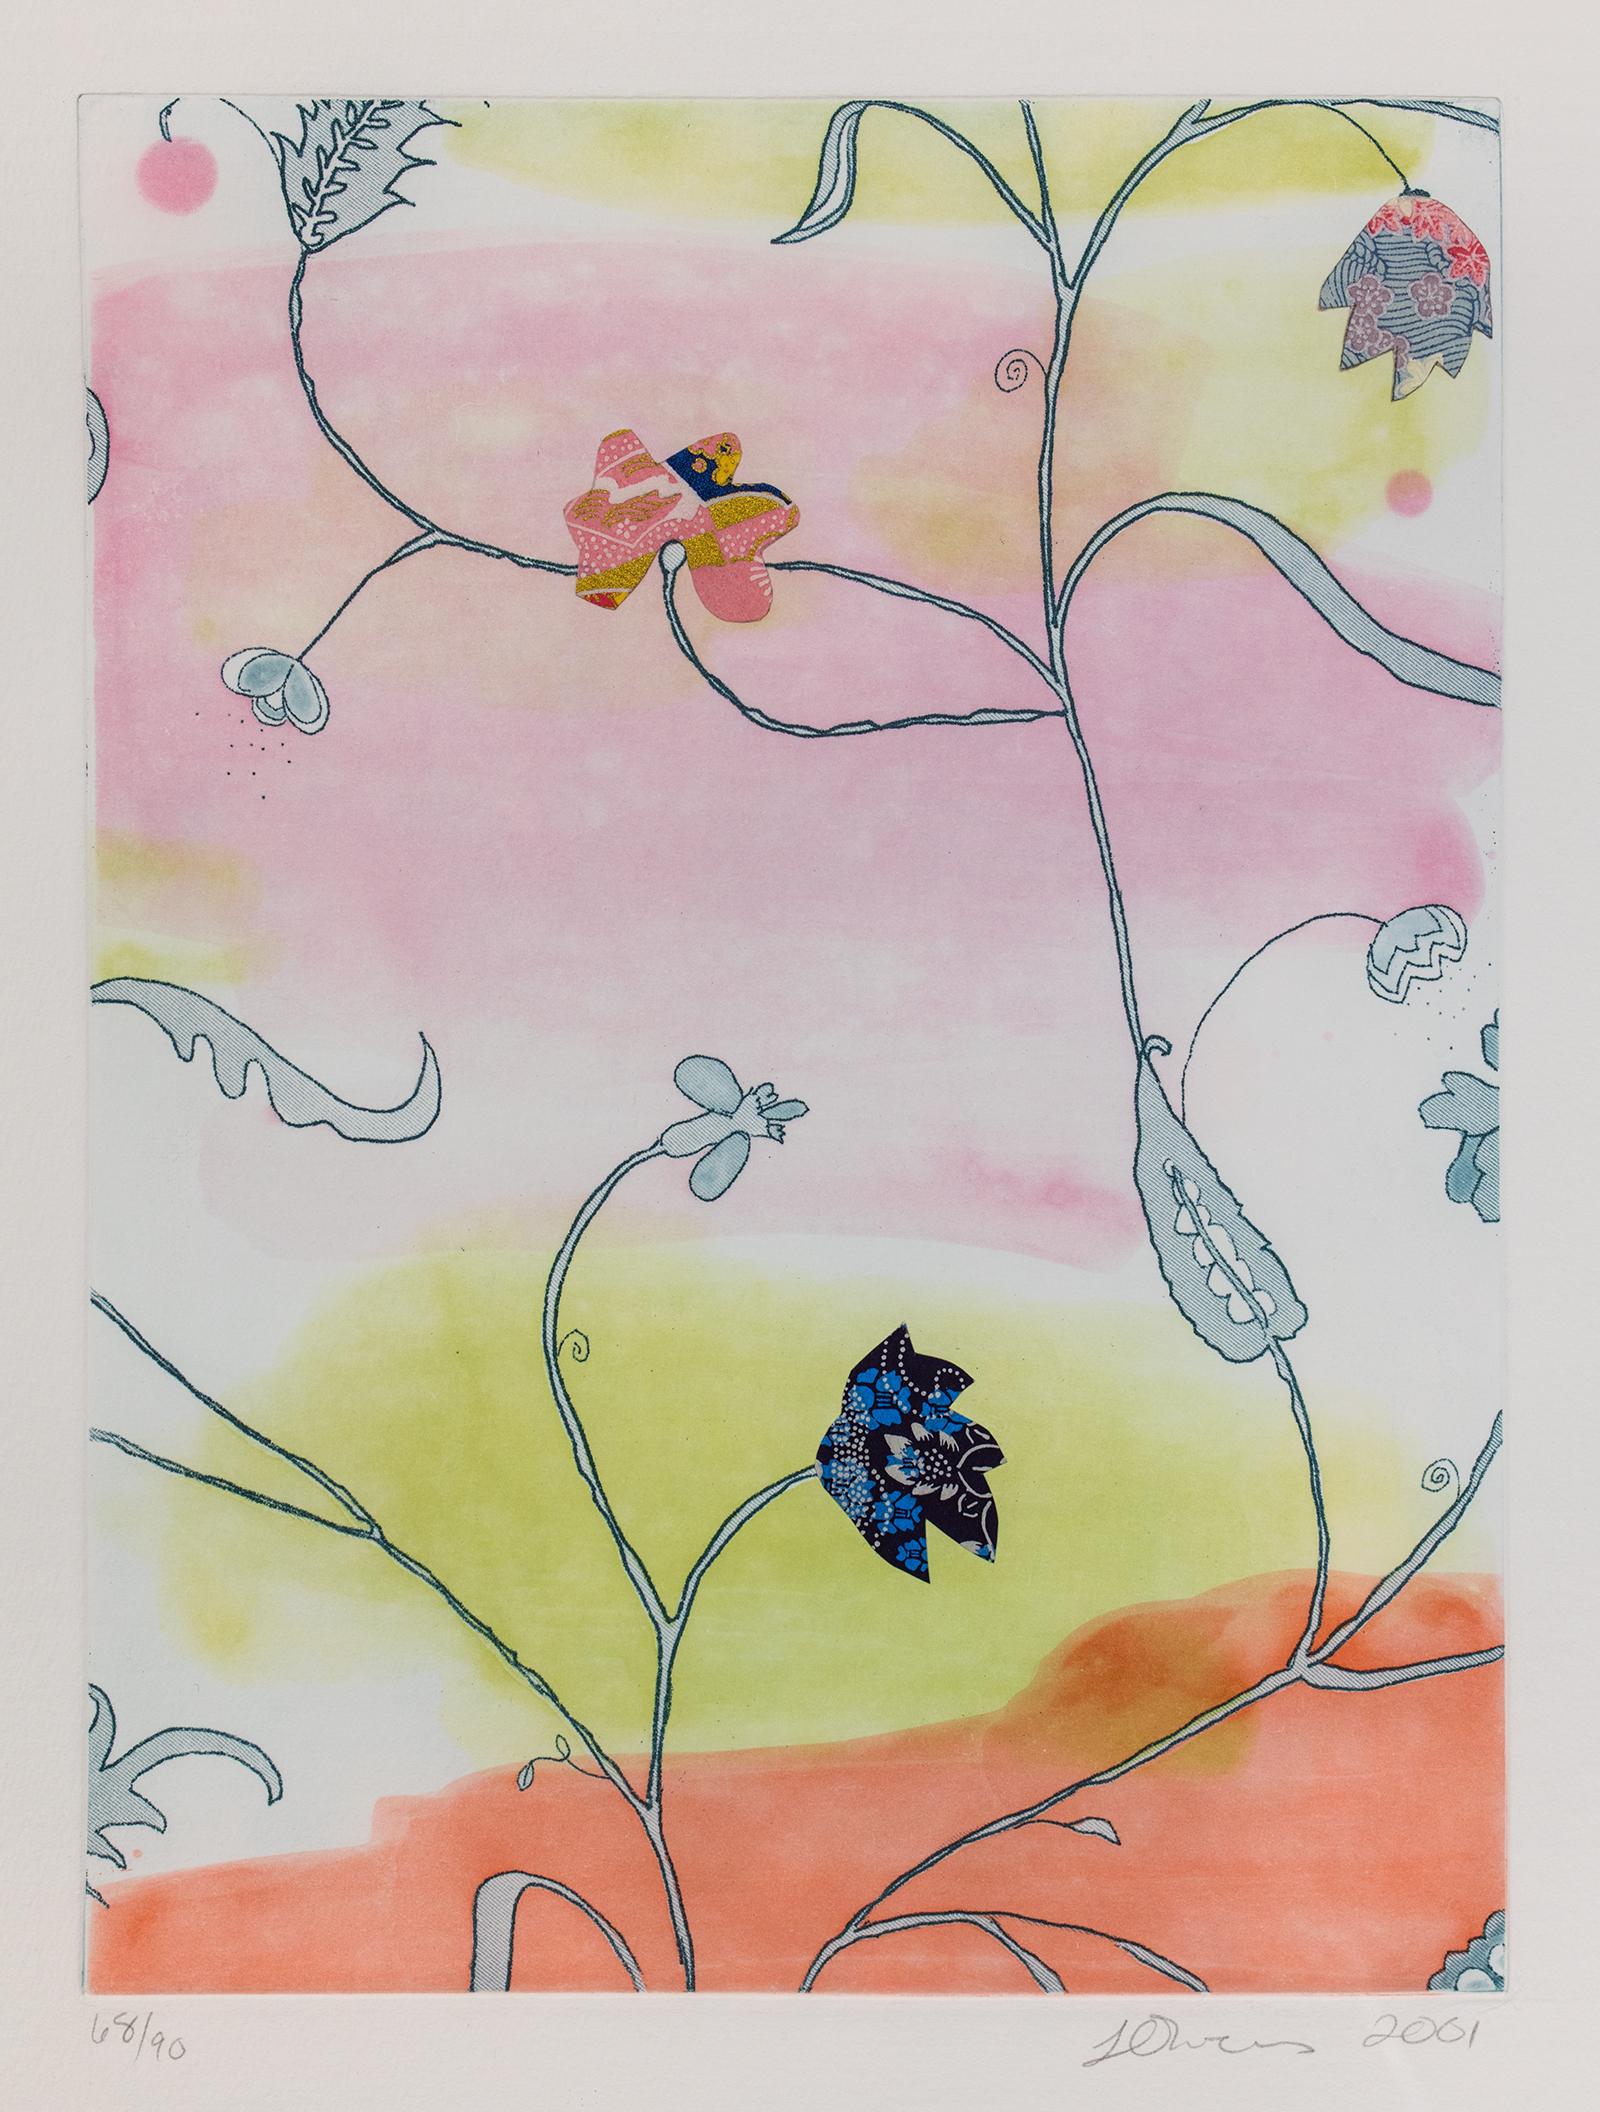 Laura Owens, Untitled, 2001